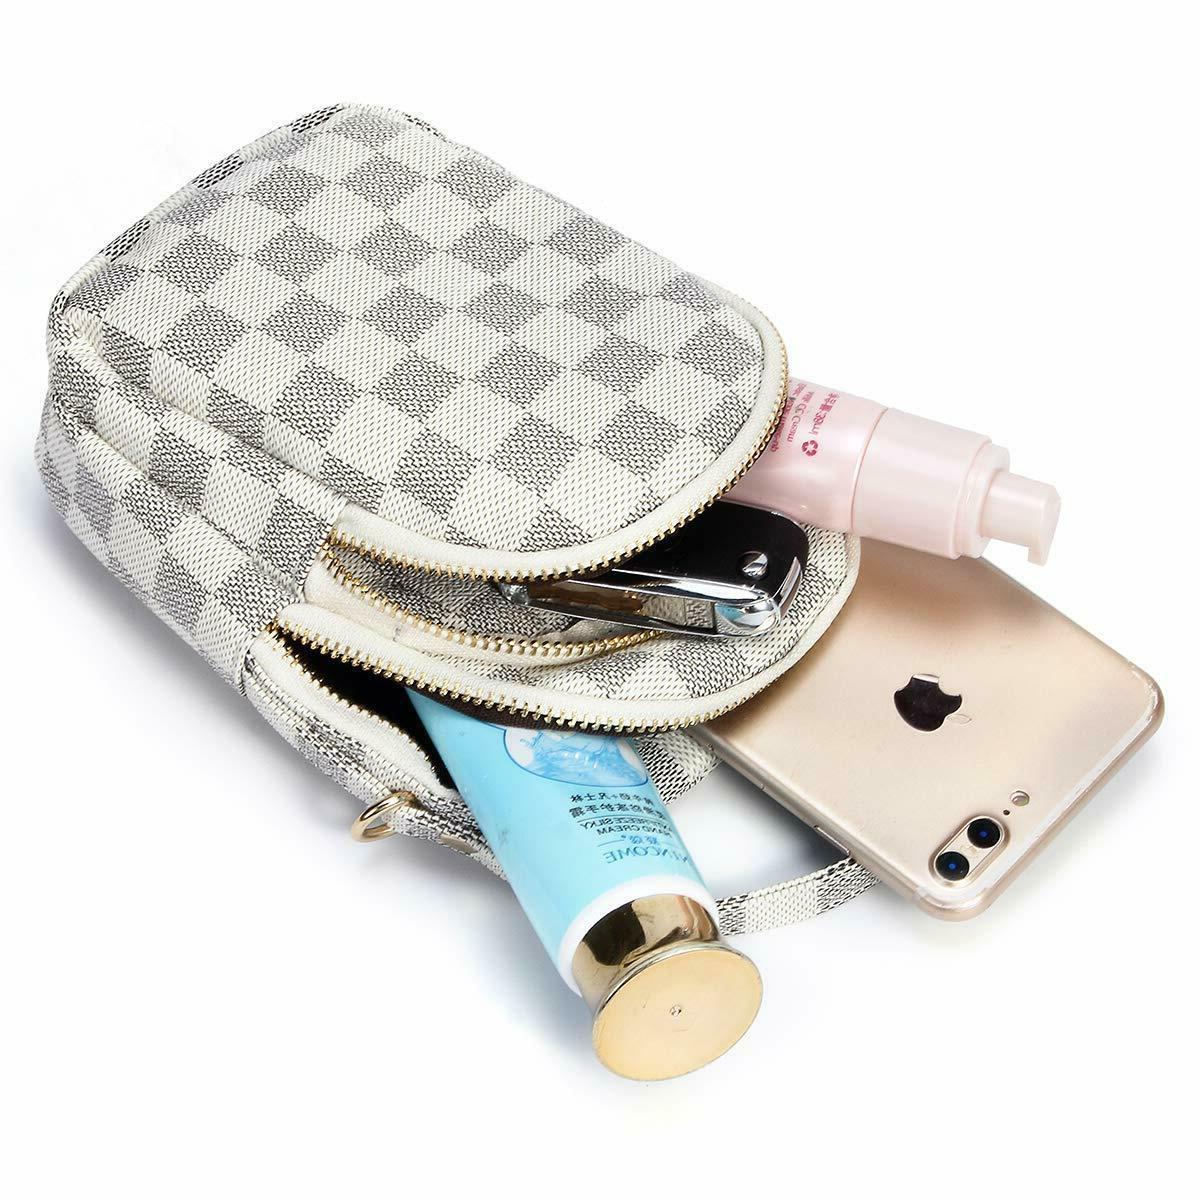 Small Bag Smartphone Purse